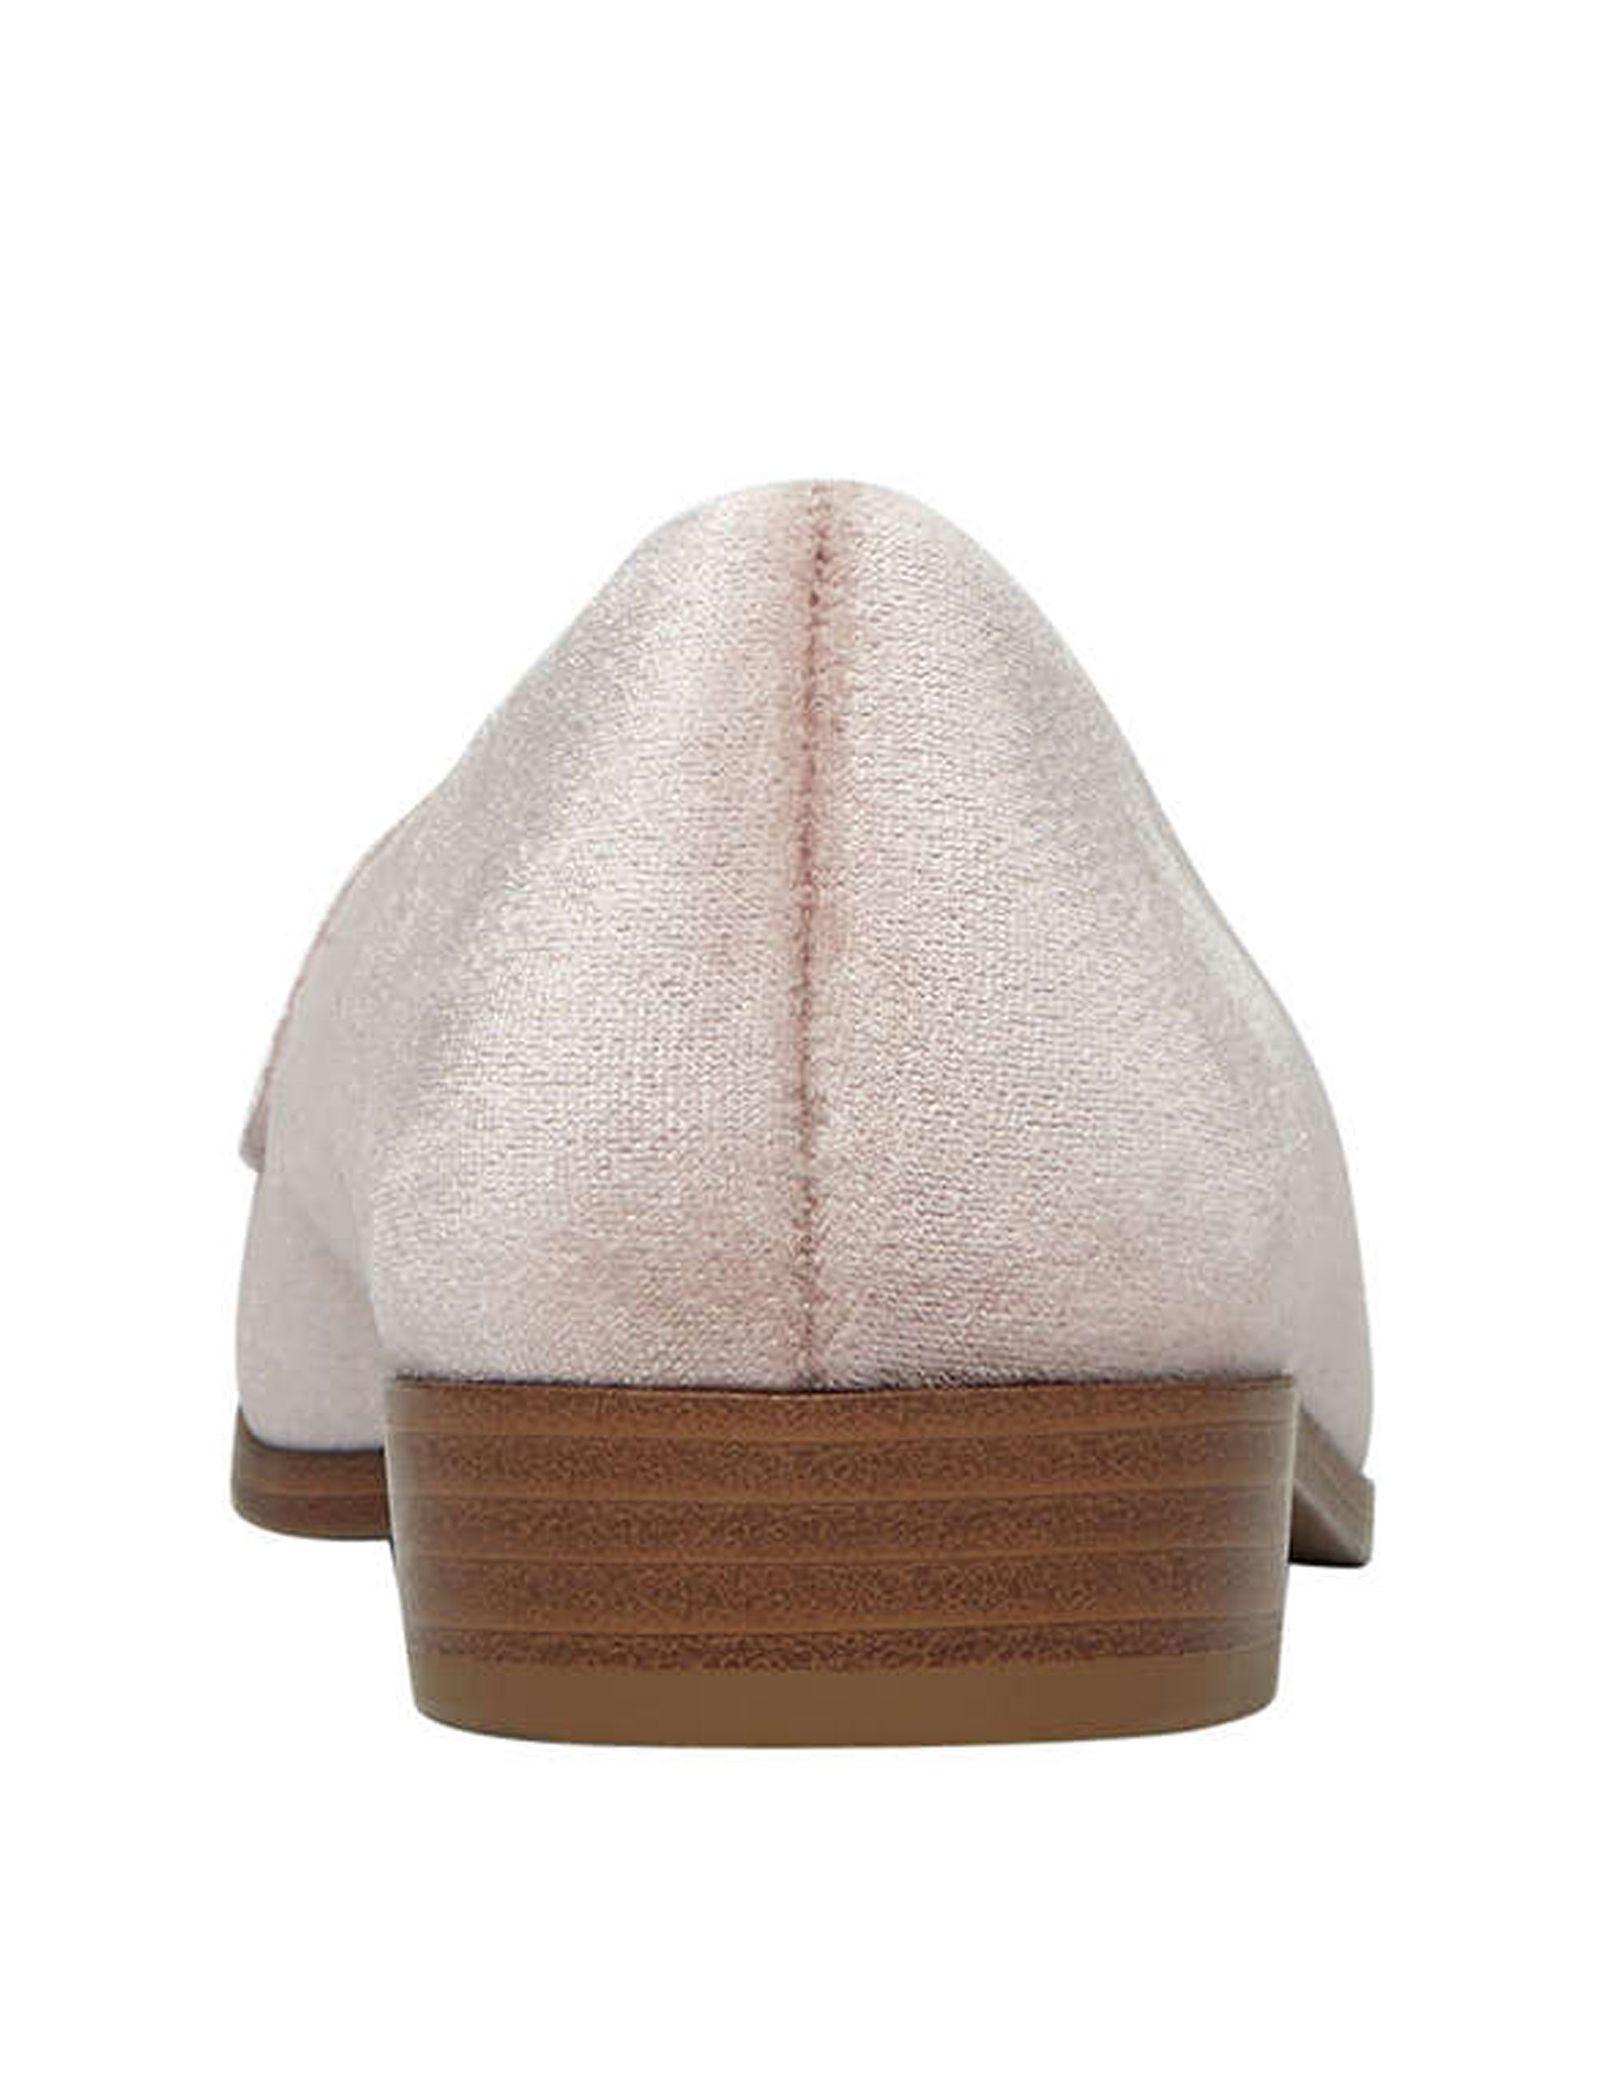 کفش تخت زنانه - کال ایت اسپرینگ - صورتي روشن - 5